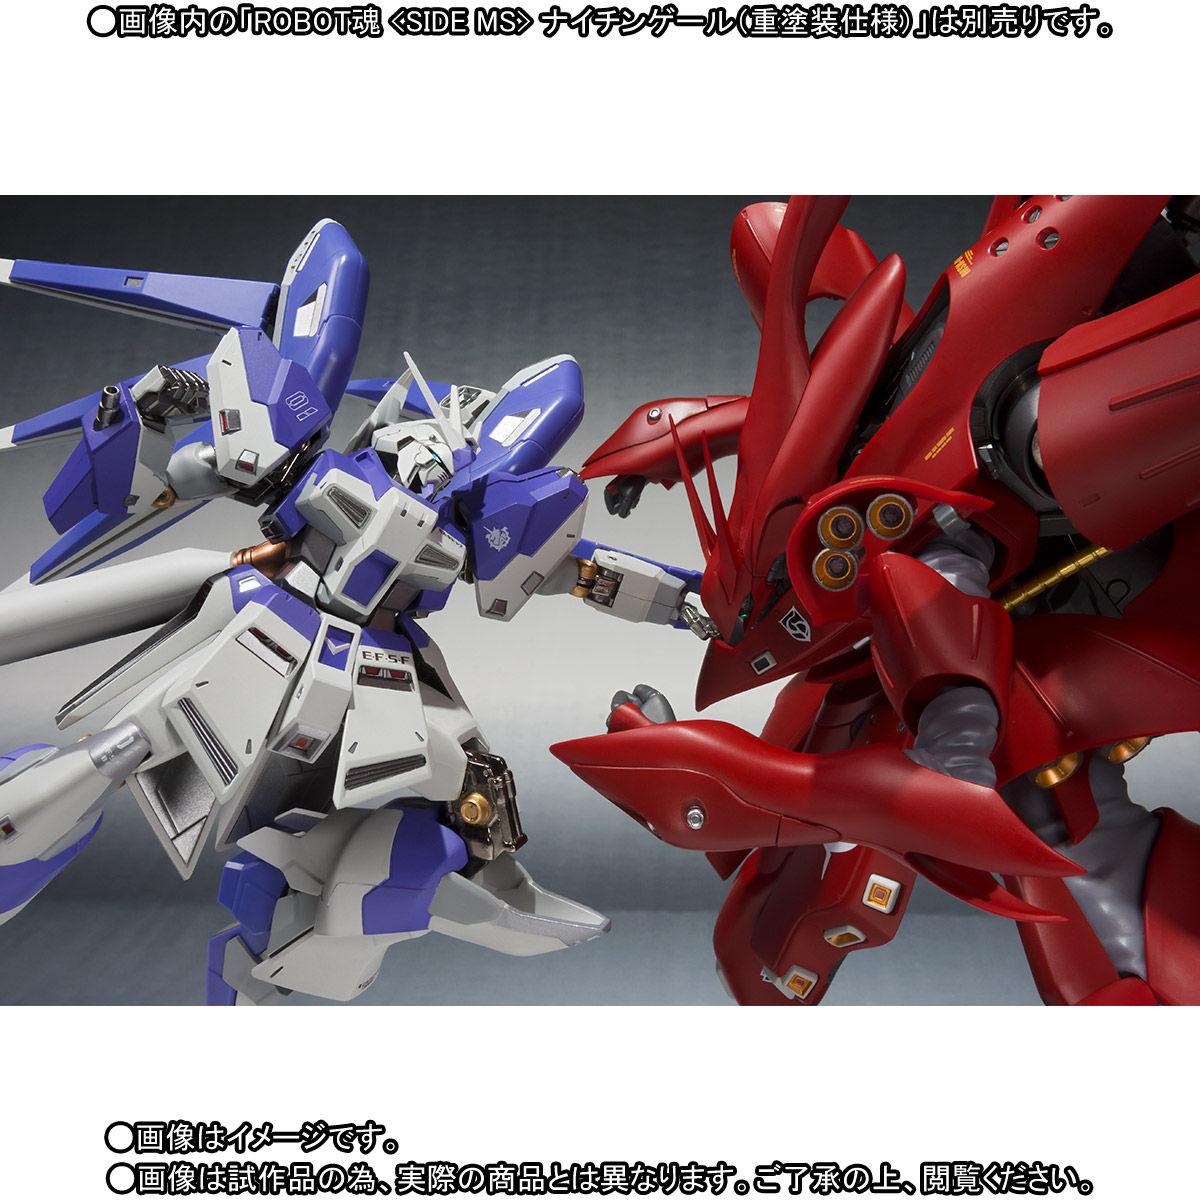 METAL ROBOT魂〈SIDE MS〉『Hi-νガンダム』逆襲のシャア 可動フィギュア-009